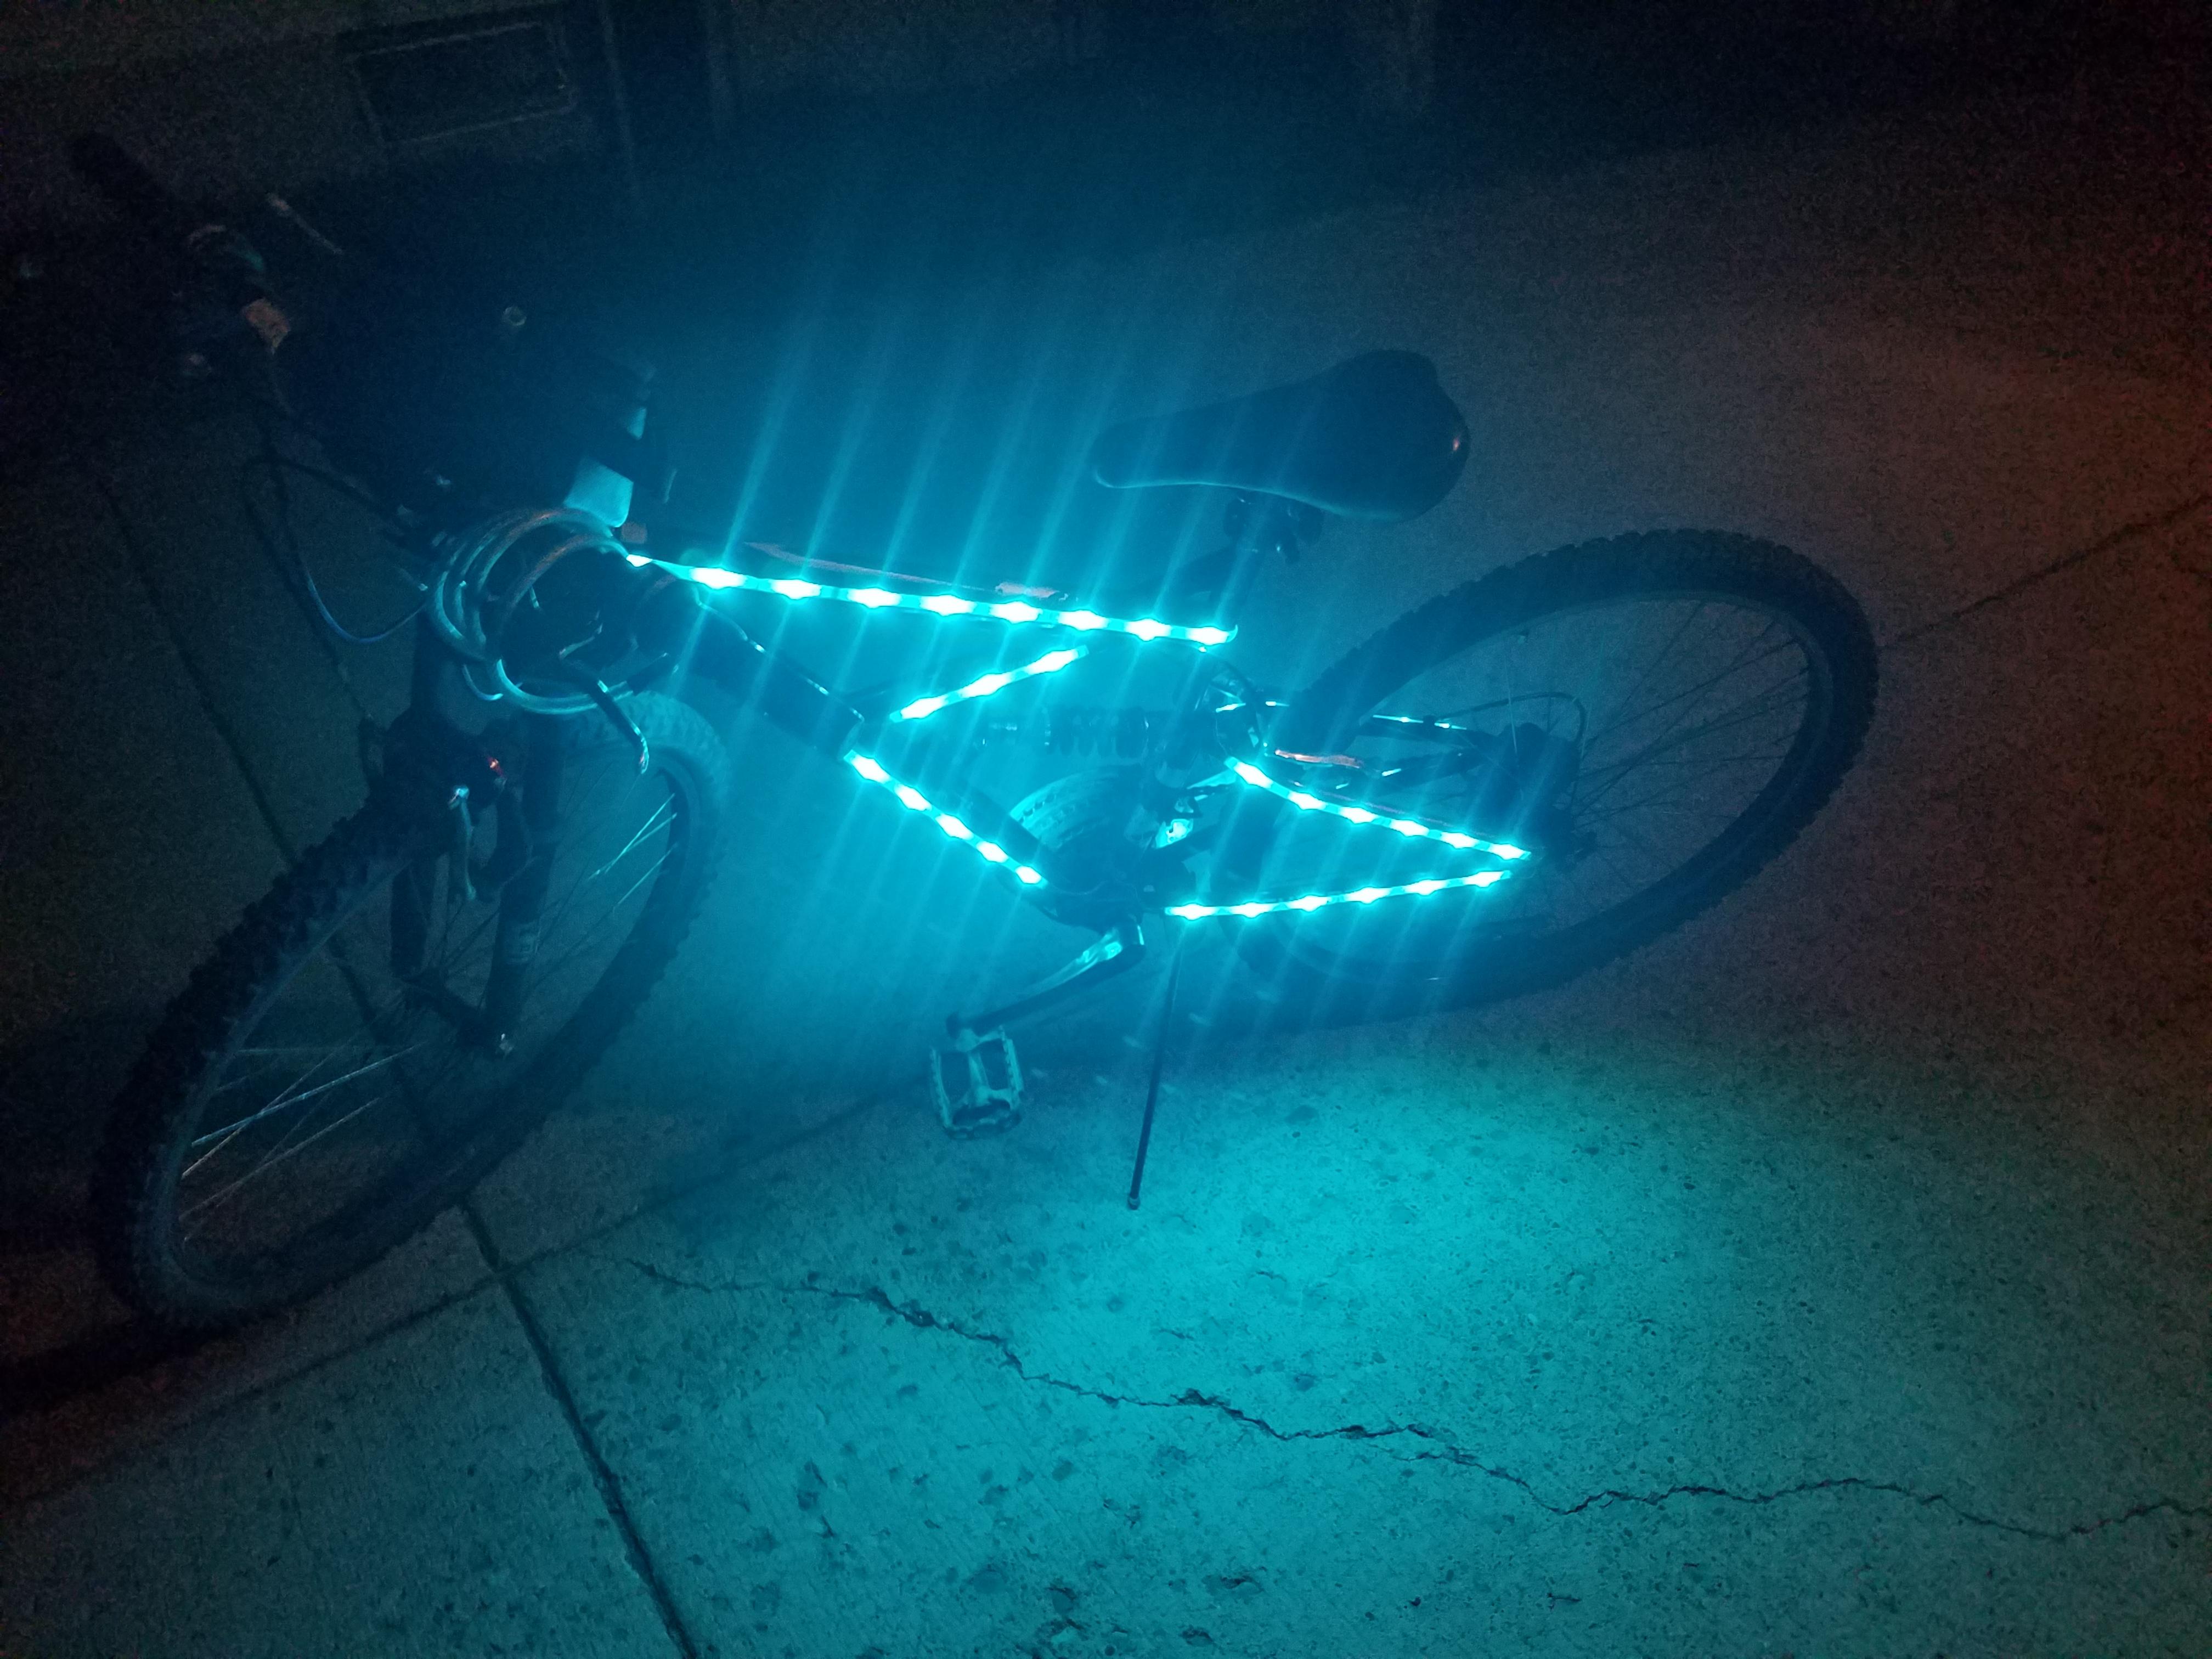 RGB LED Bike Frame Lighting Mod